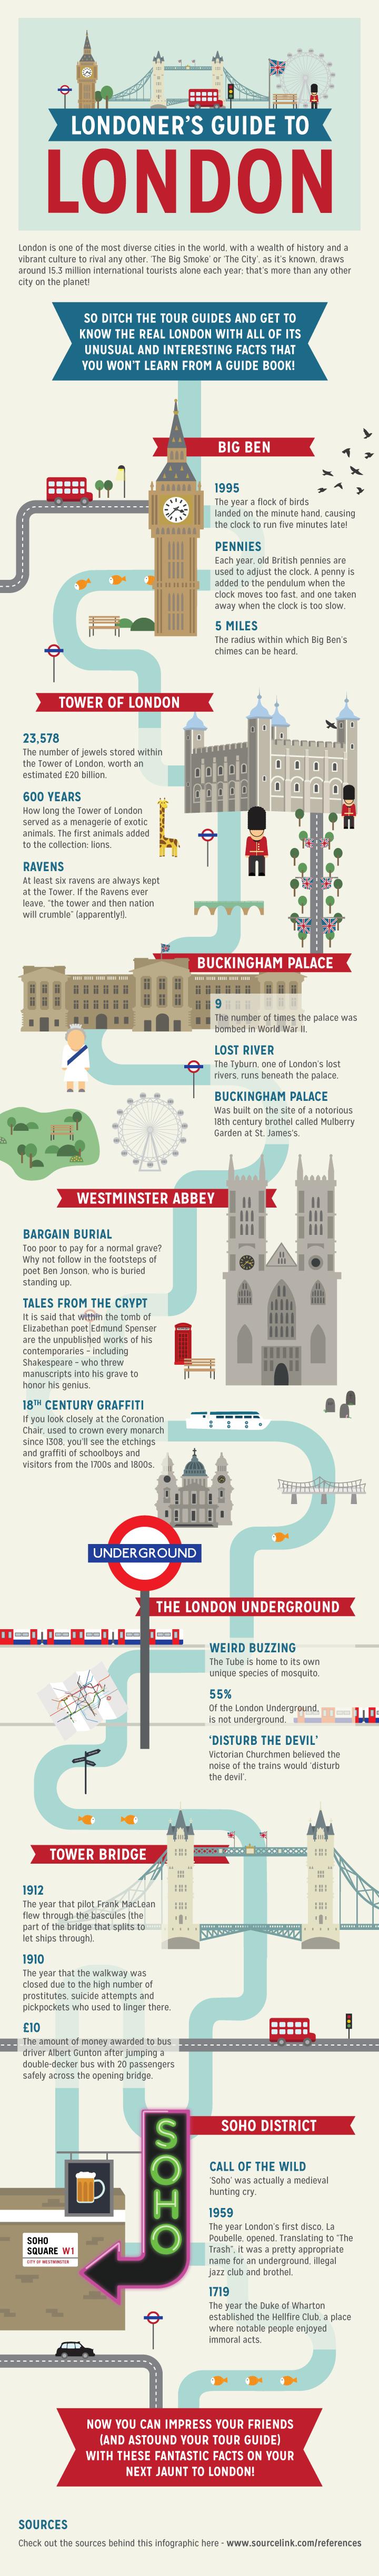 London Confidential-Infographic